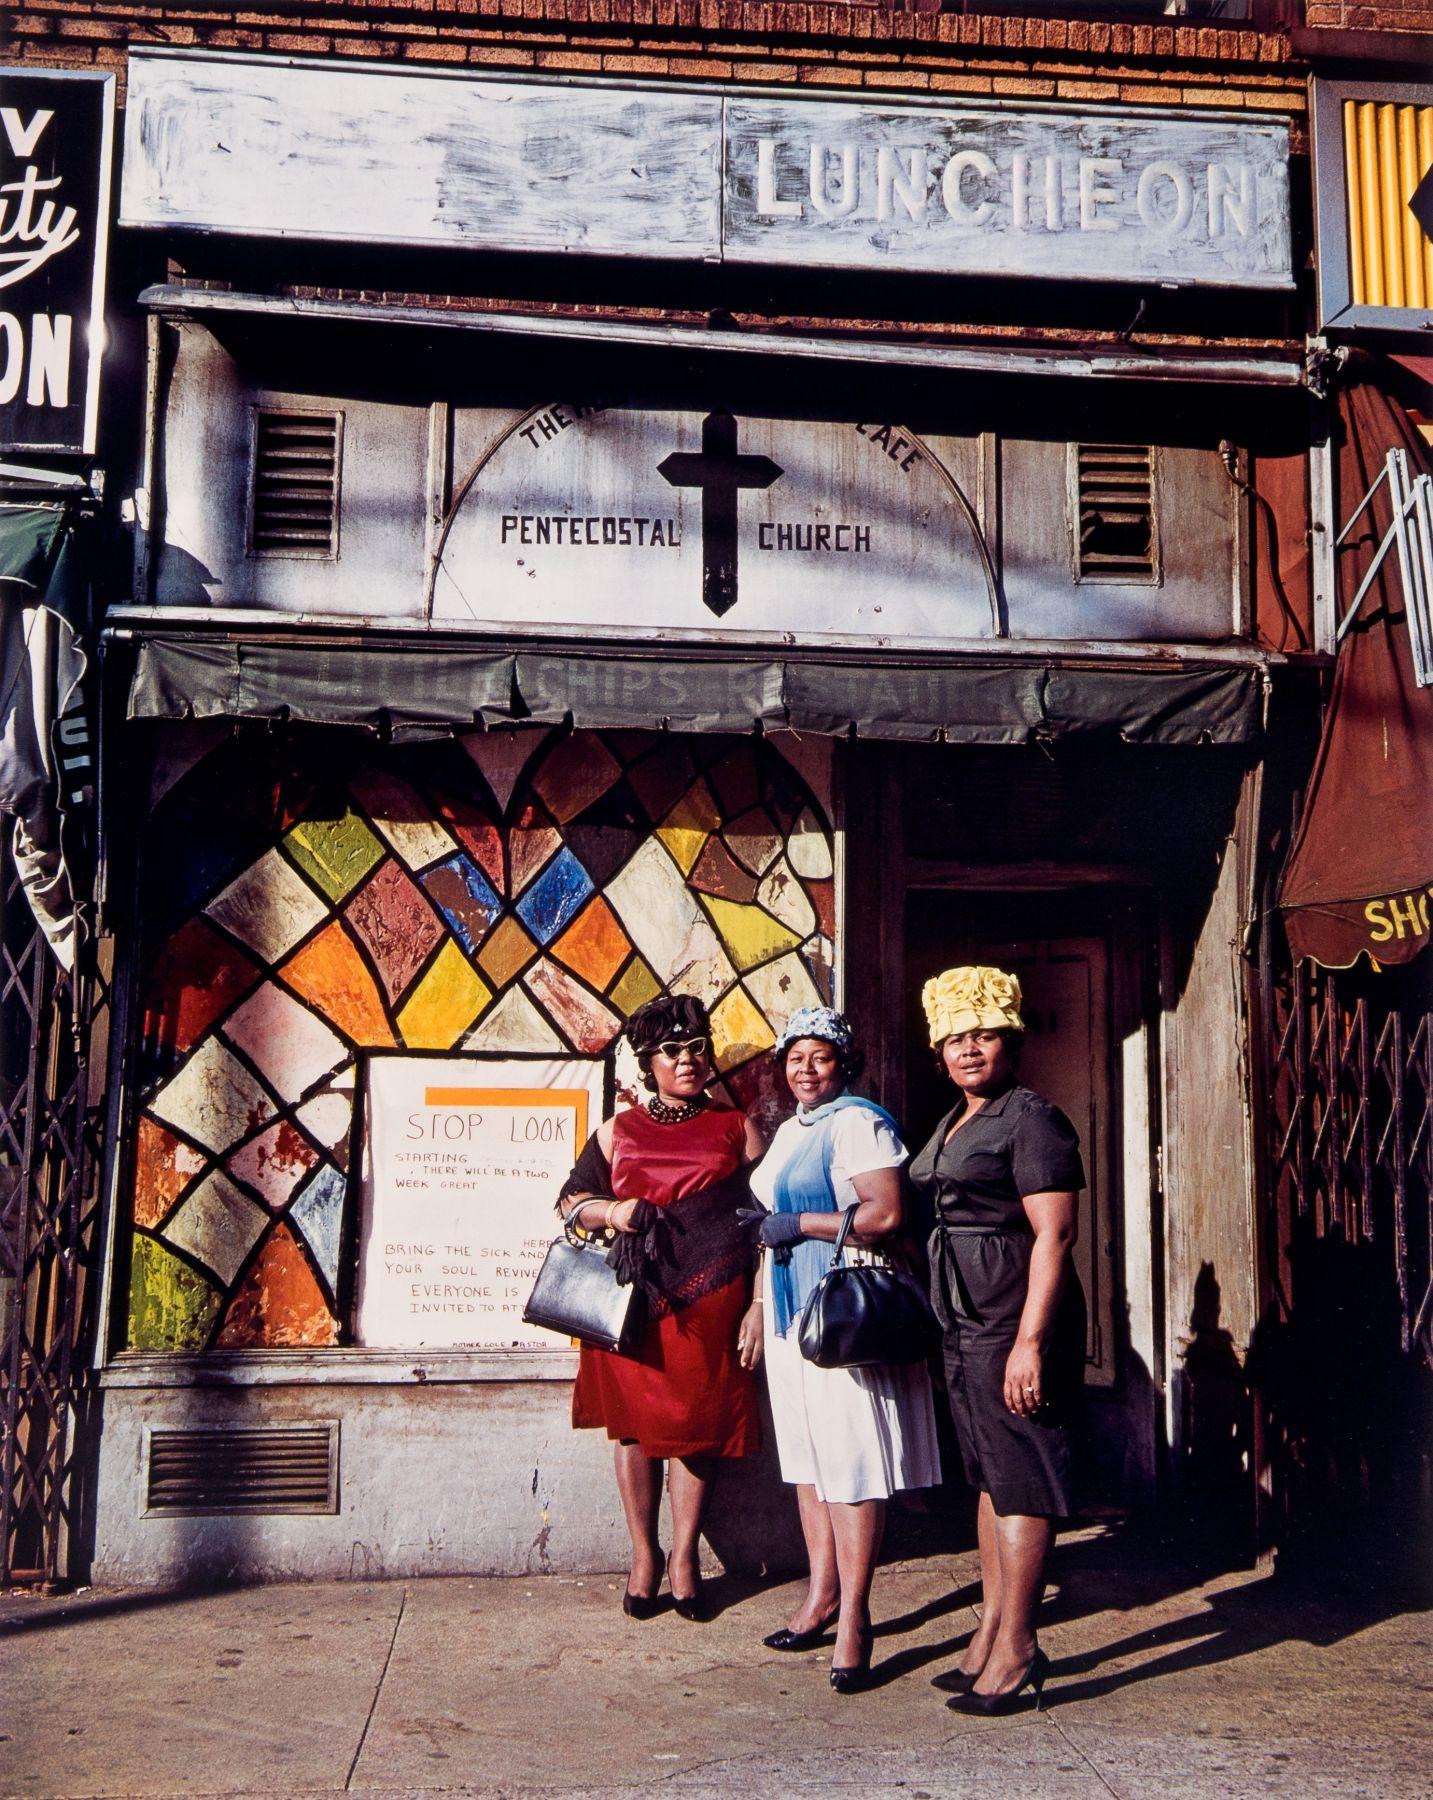 Harlem Church, New York. 1964, 20 x 16 inch dye transfer print